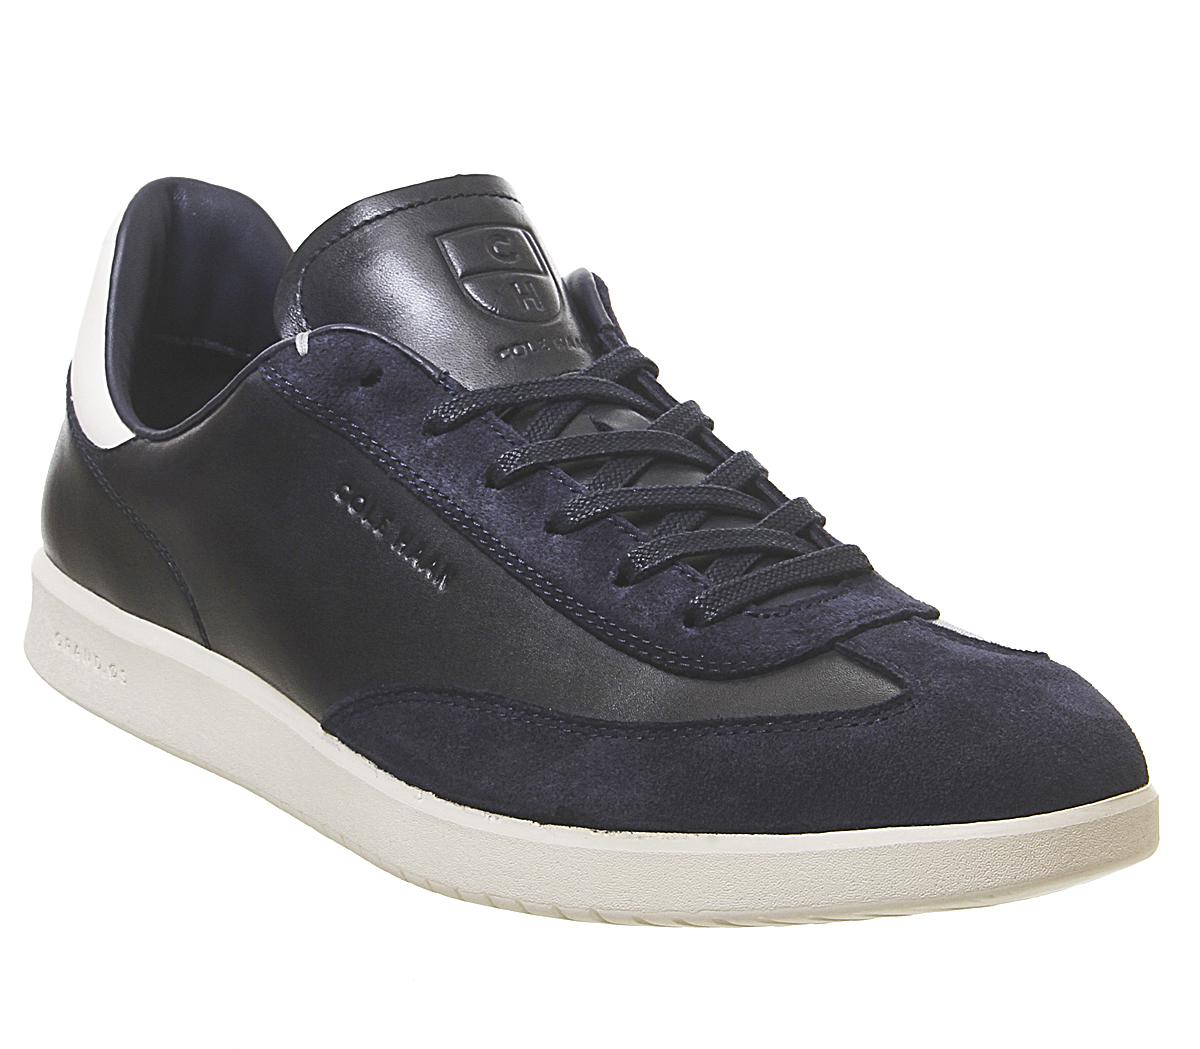 Grandpro Turf Sneakers